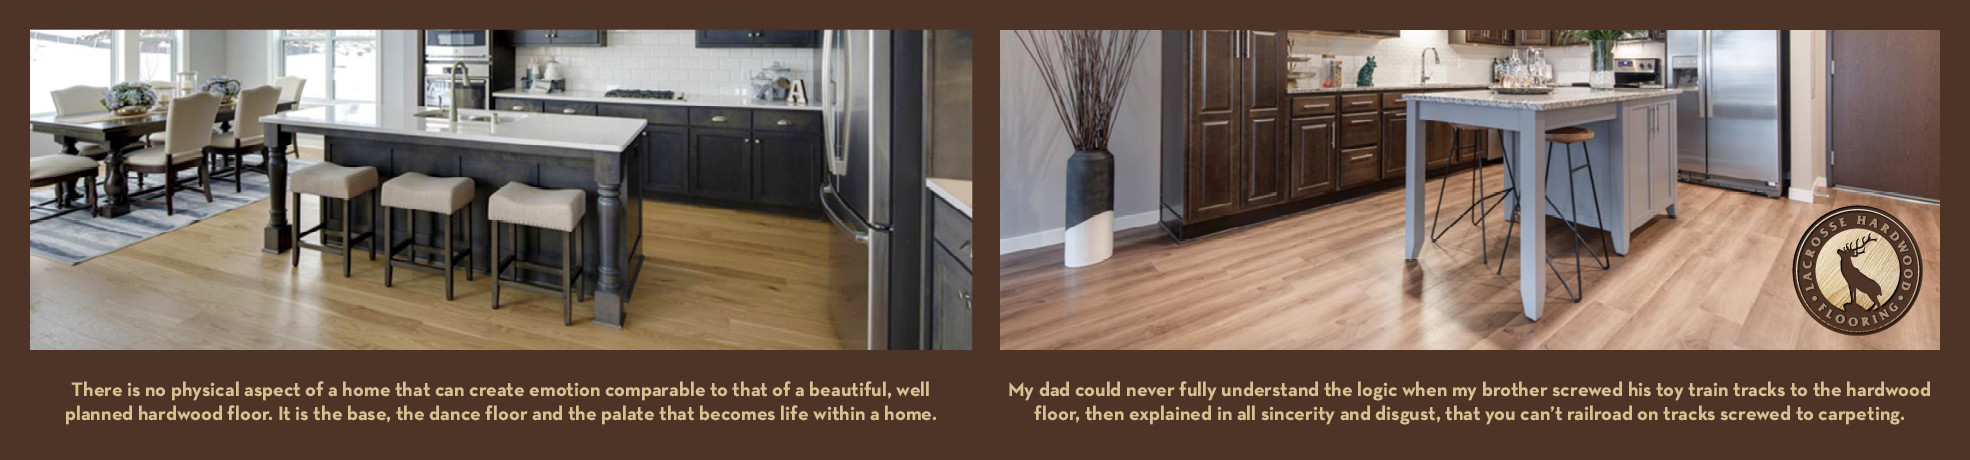 hardwood floor installation atlanta of lacrosse hardwood flooring walnut white oak red oak hickory in lhfsliderv24